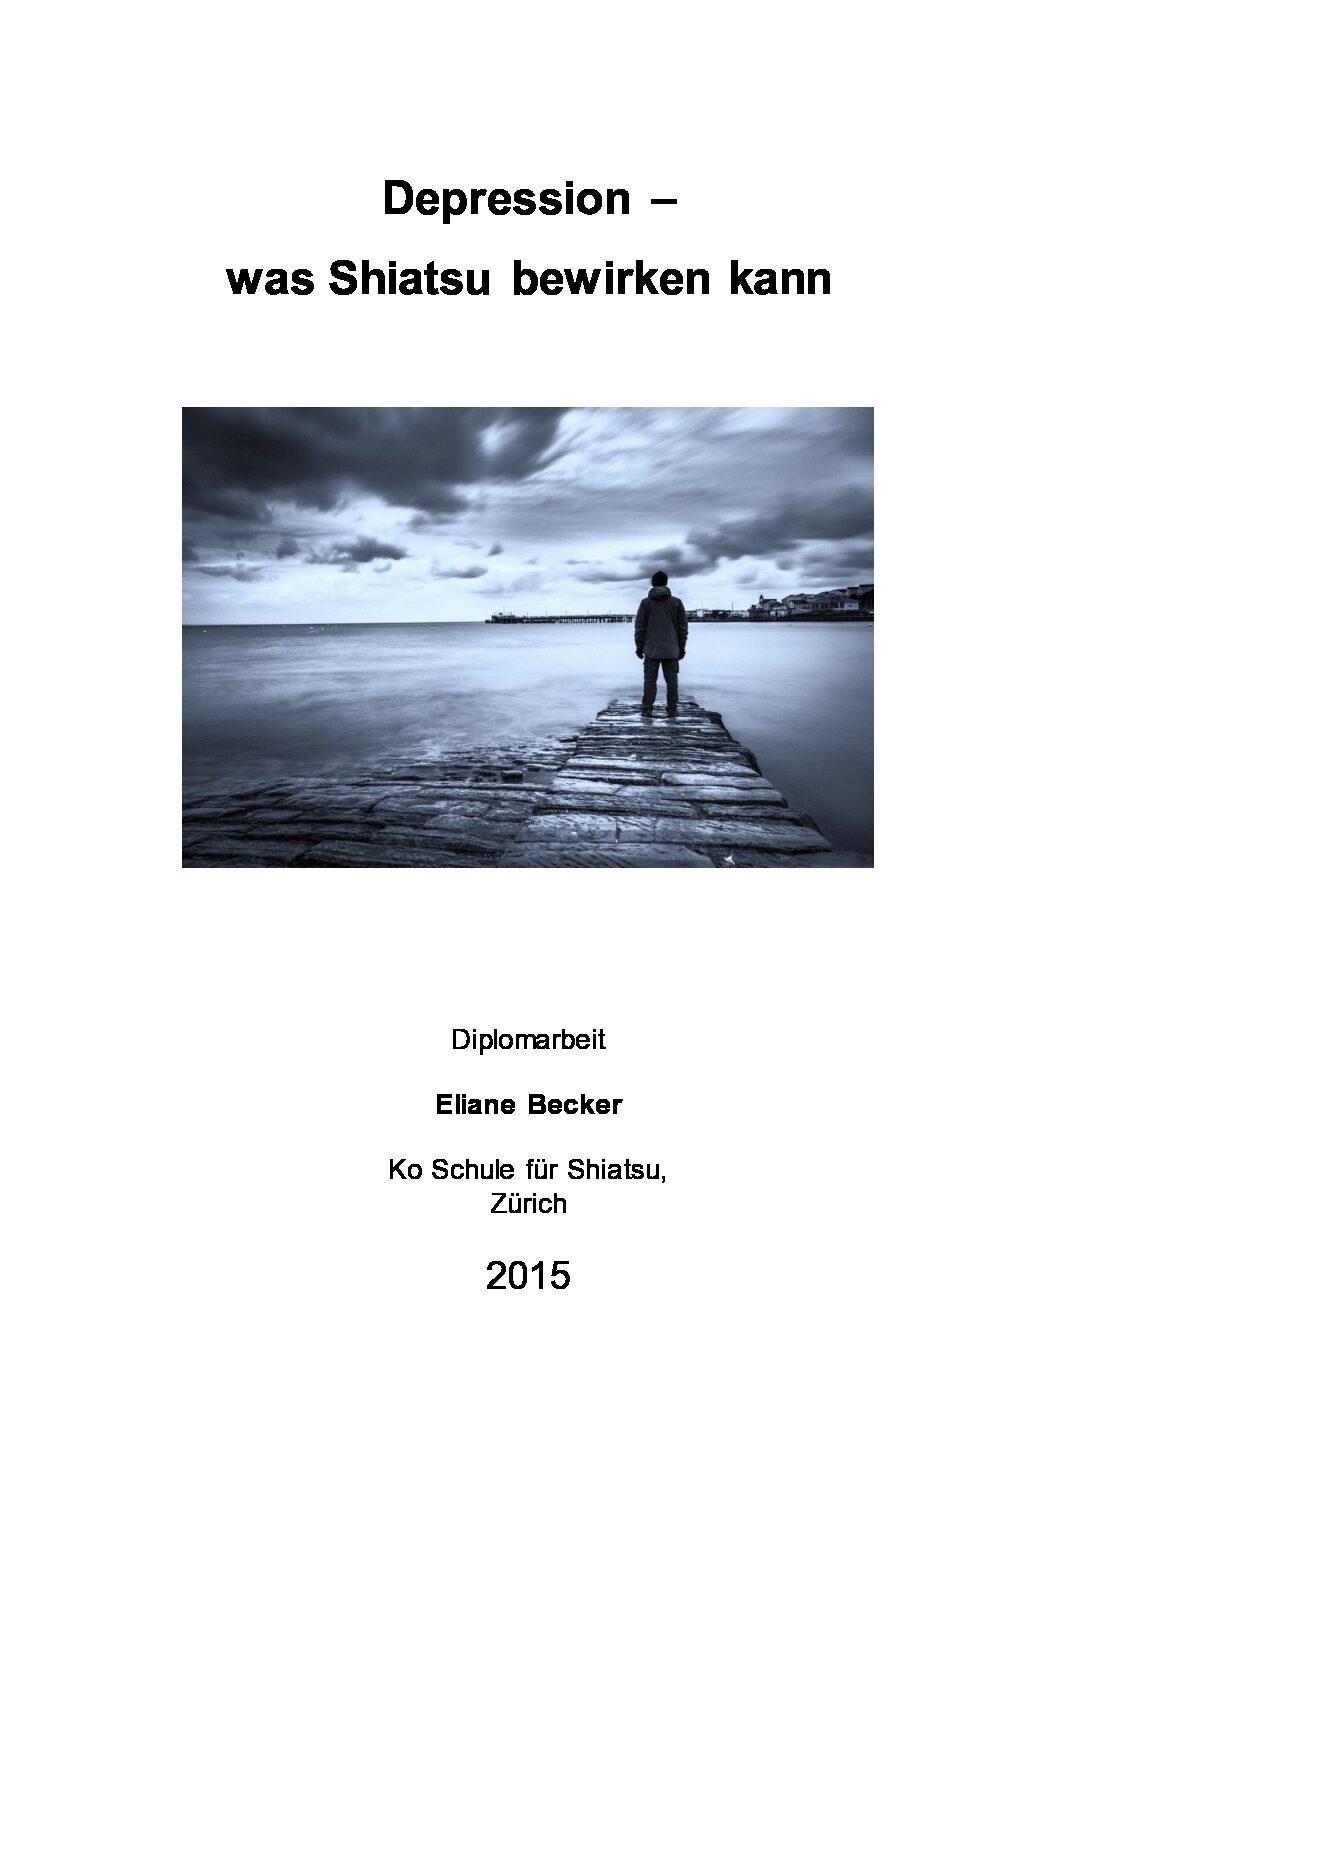 Depression – Was Shiatsu bewirken kann (2015, Eliane Becker)